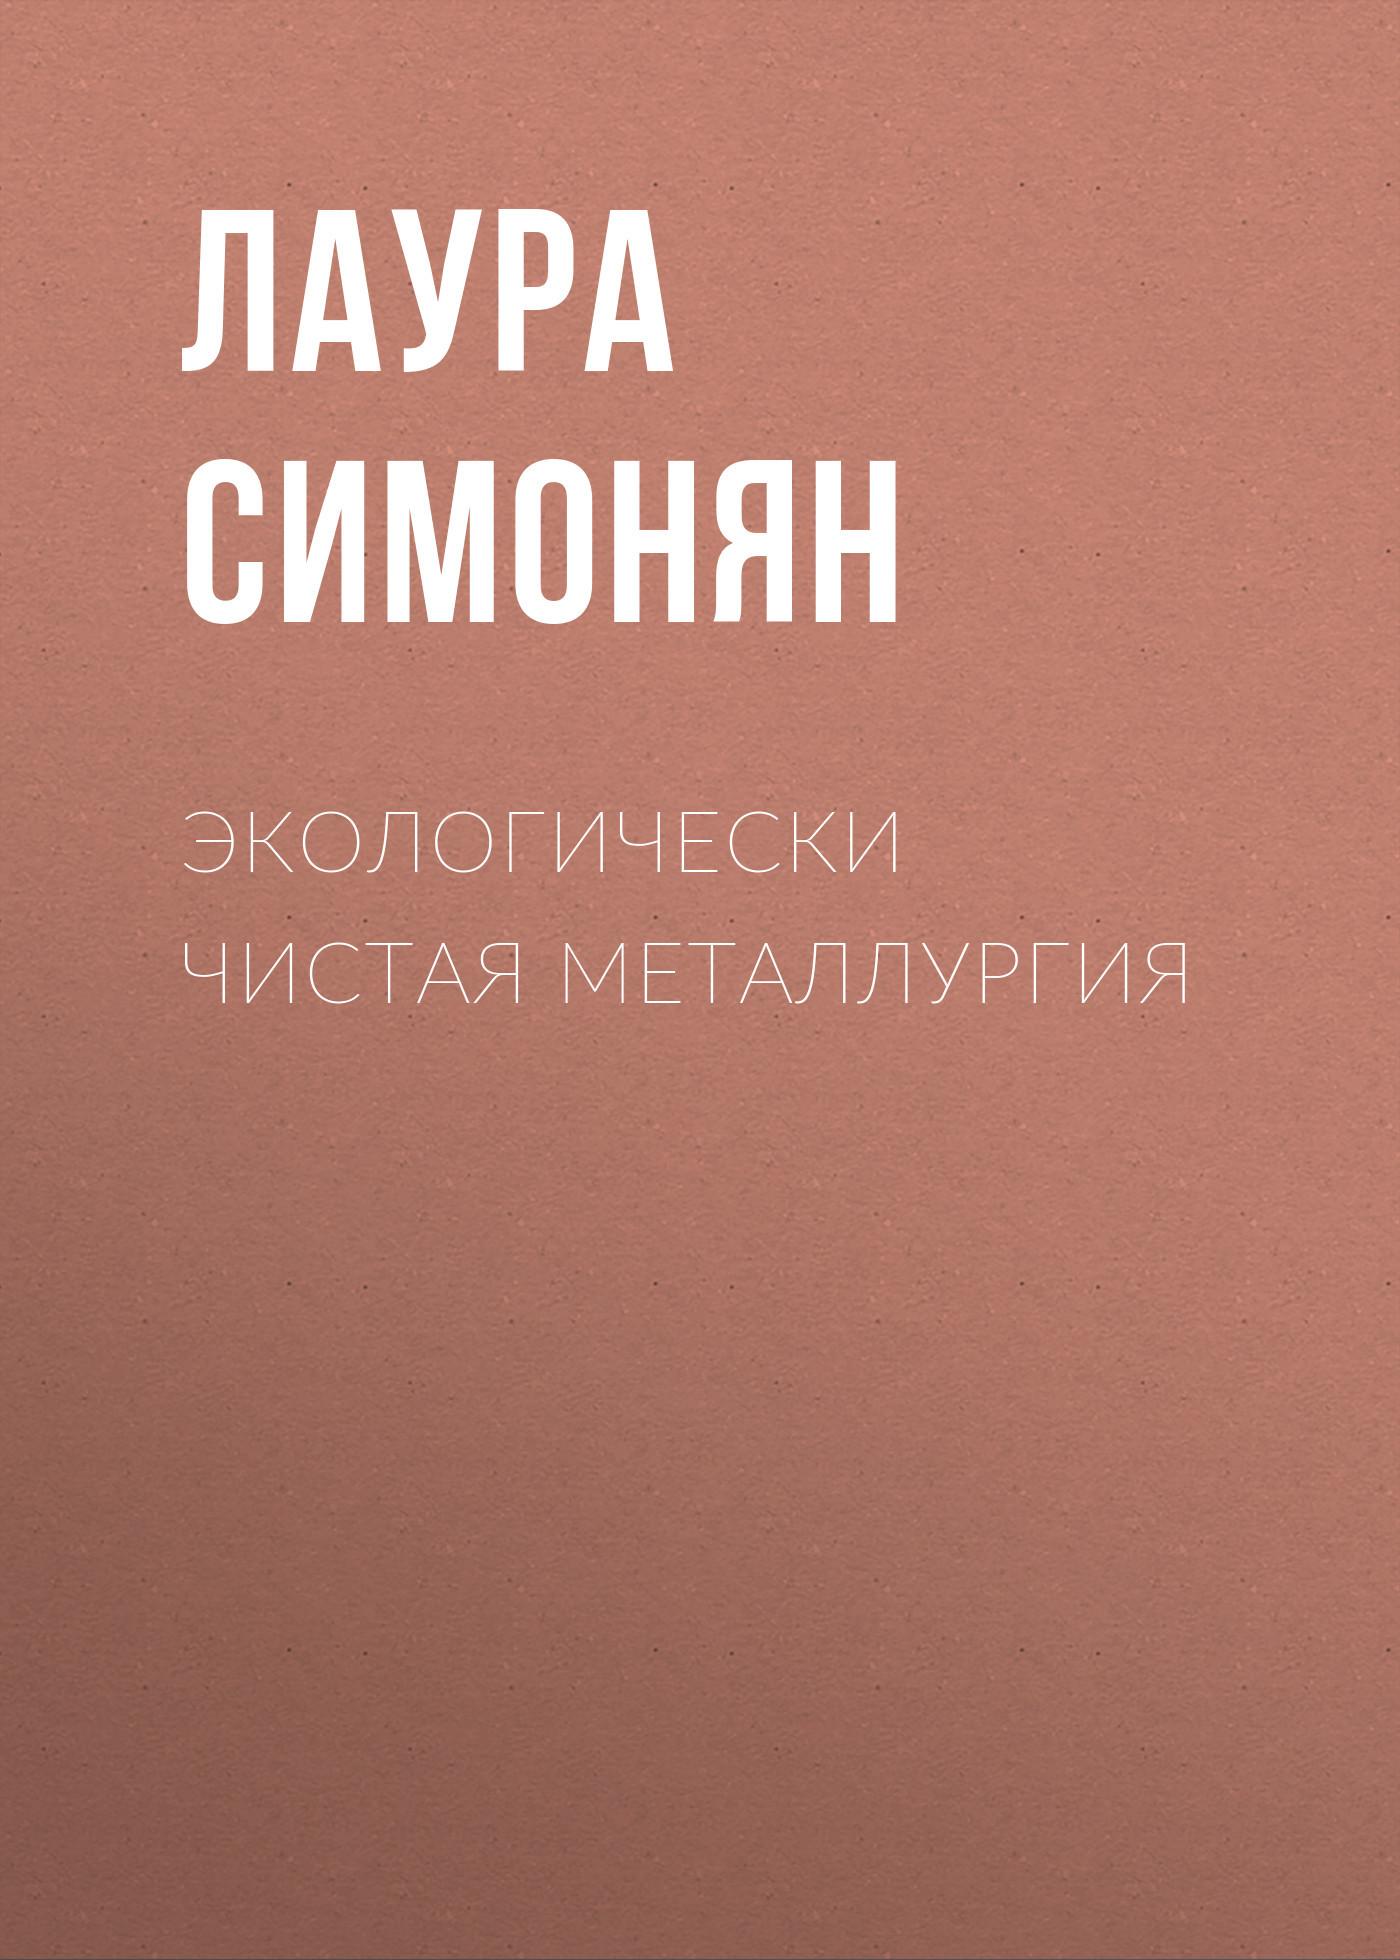 Лаура Симонян бесплатно